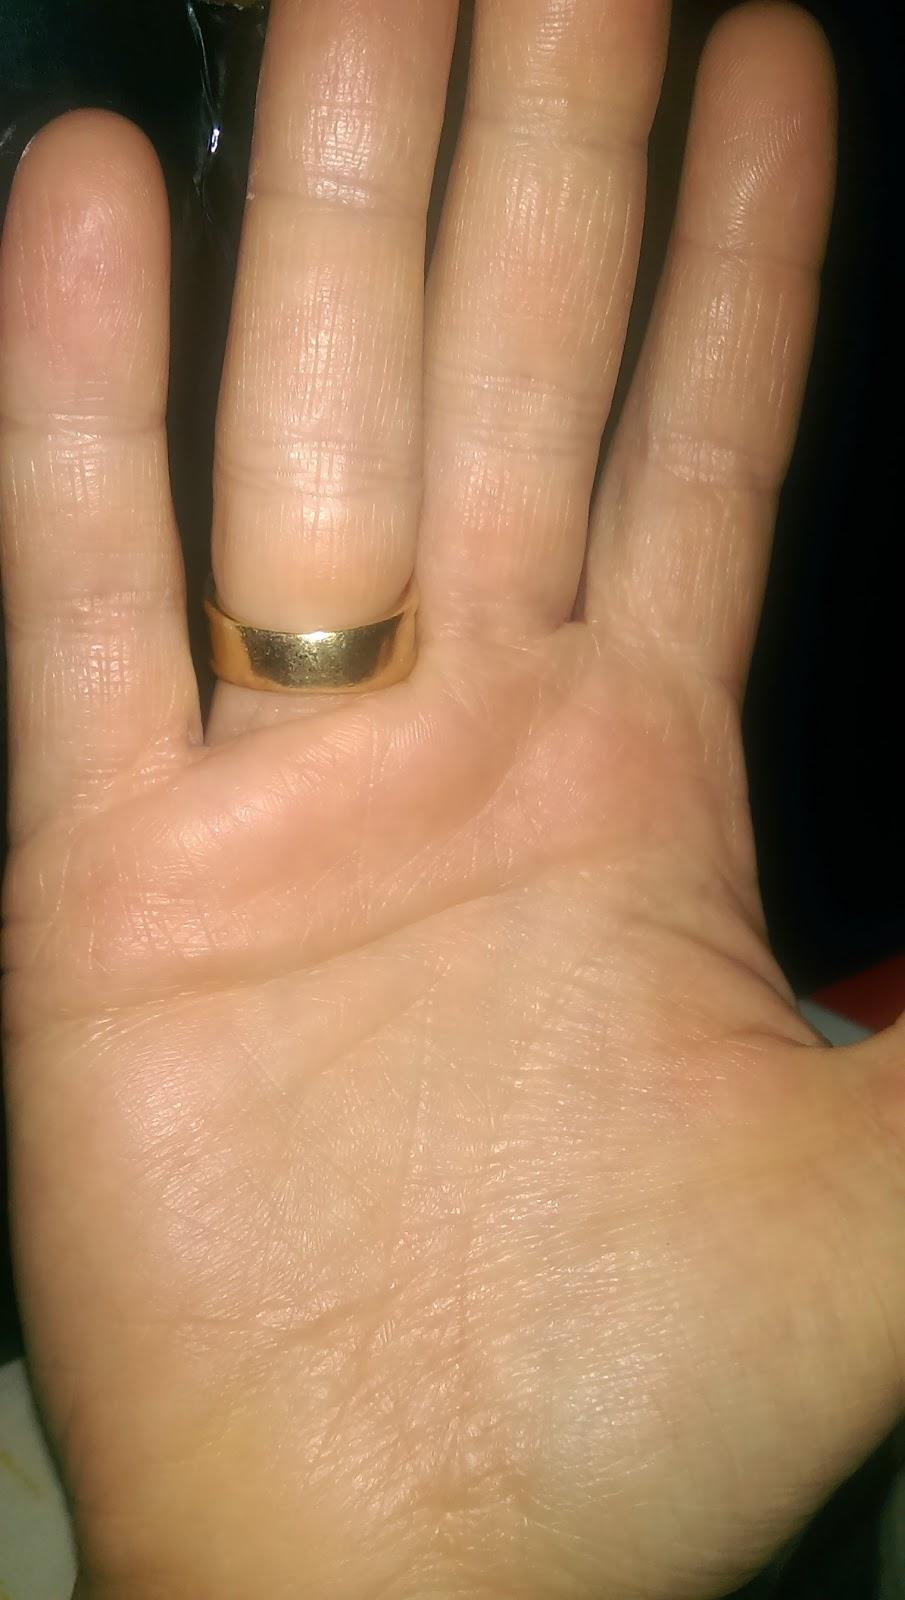 Salcura Four Seasons Winter Skin Warming Hand Therapy